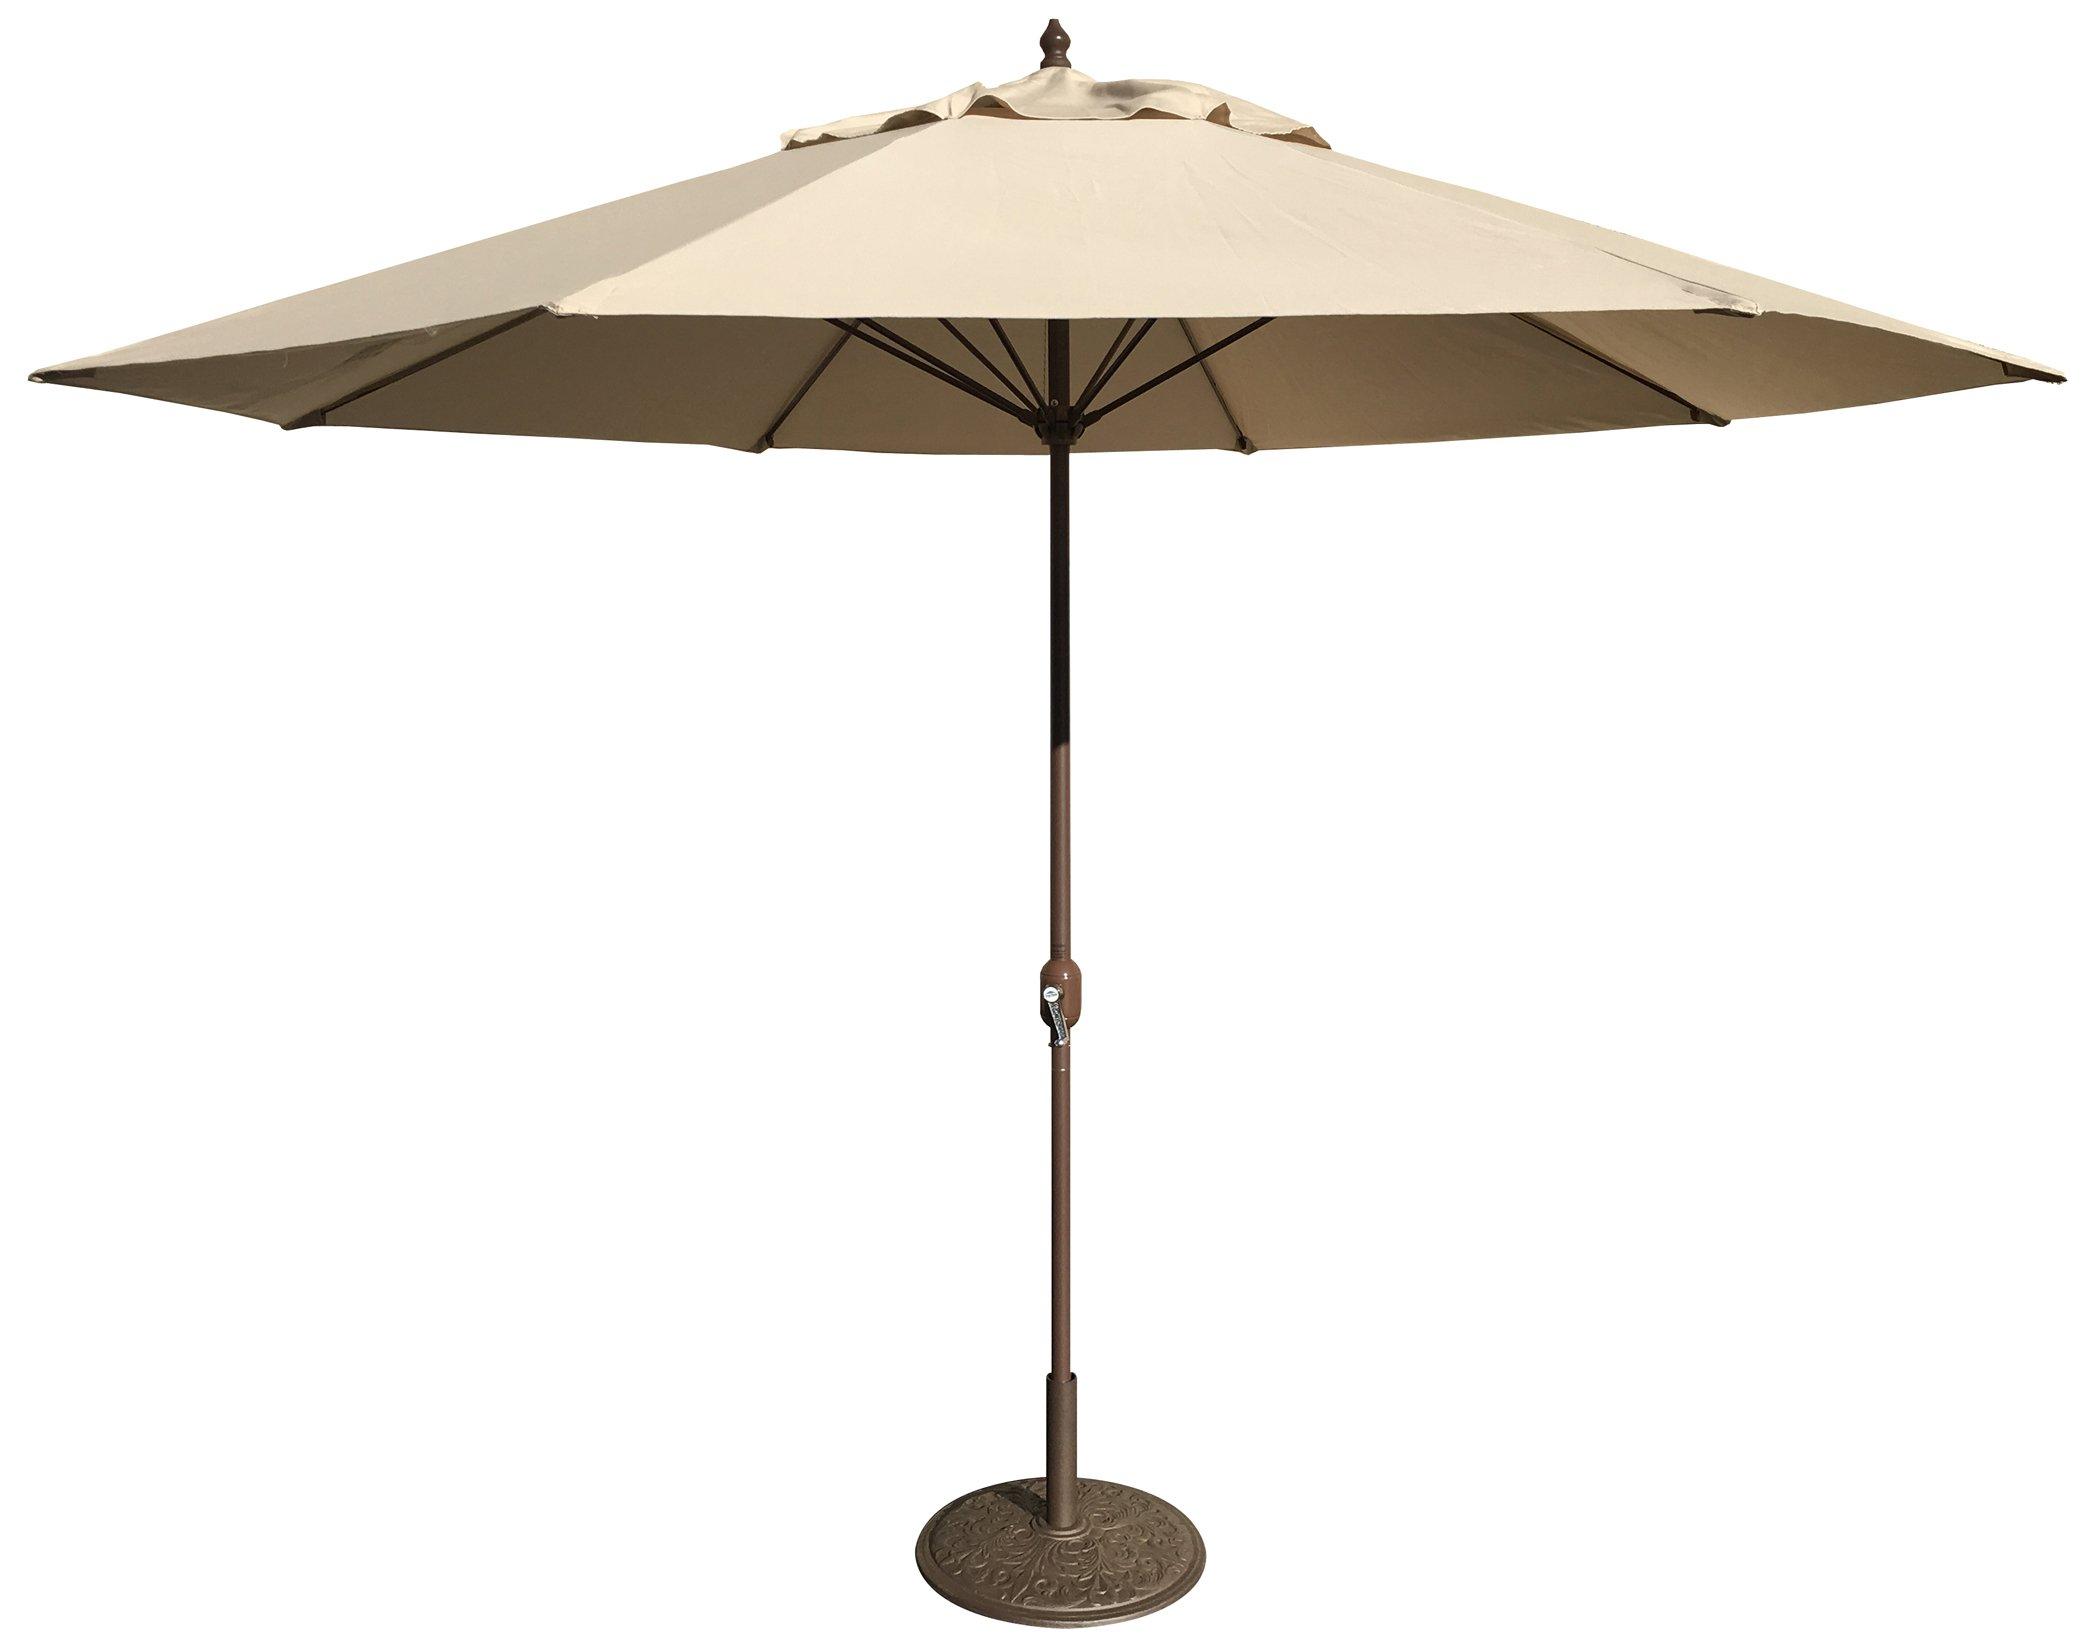 Large Outdoor Umbrellas: Amazon.com